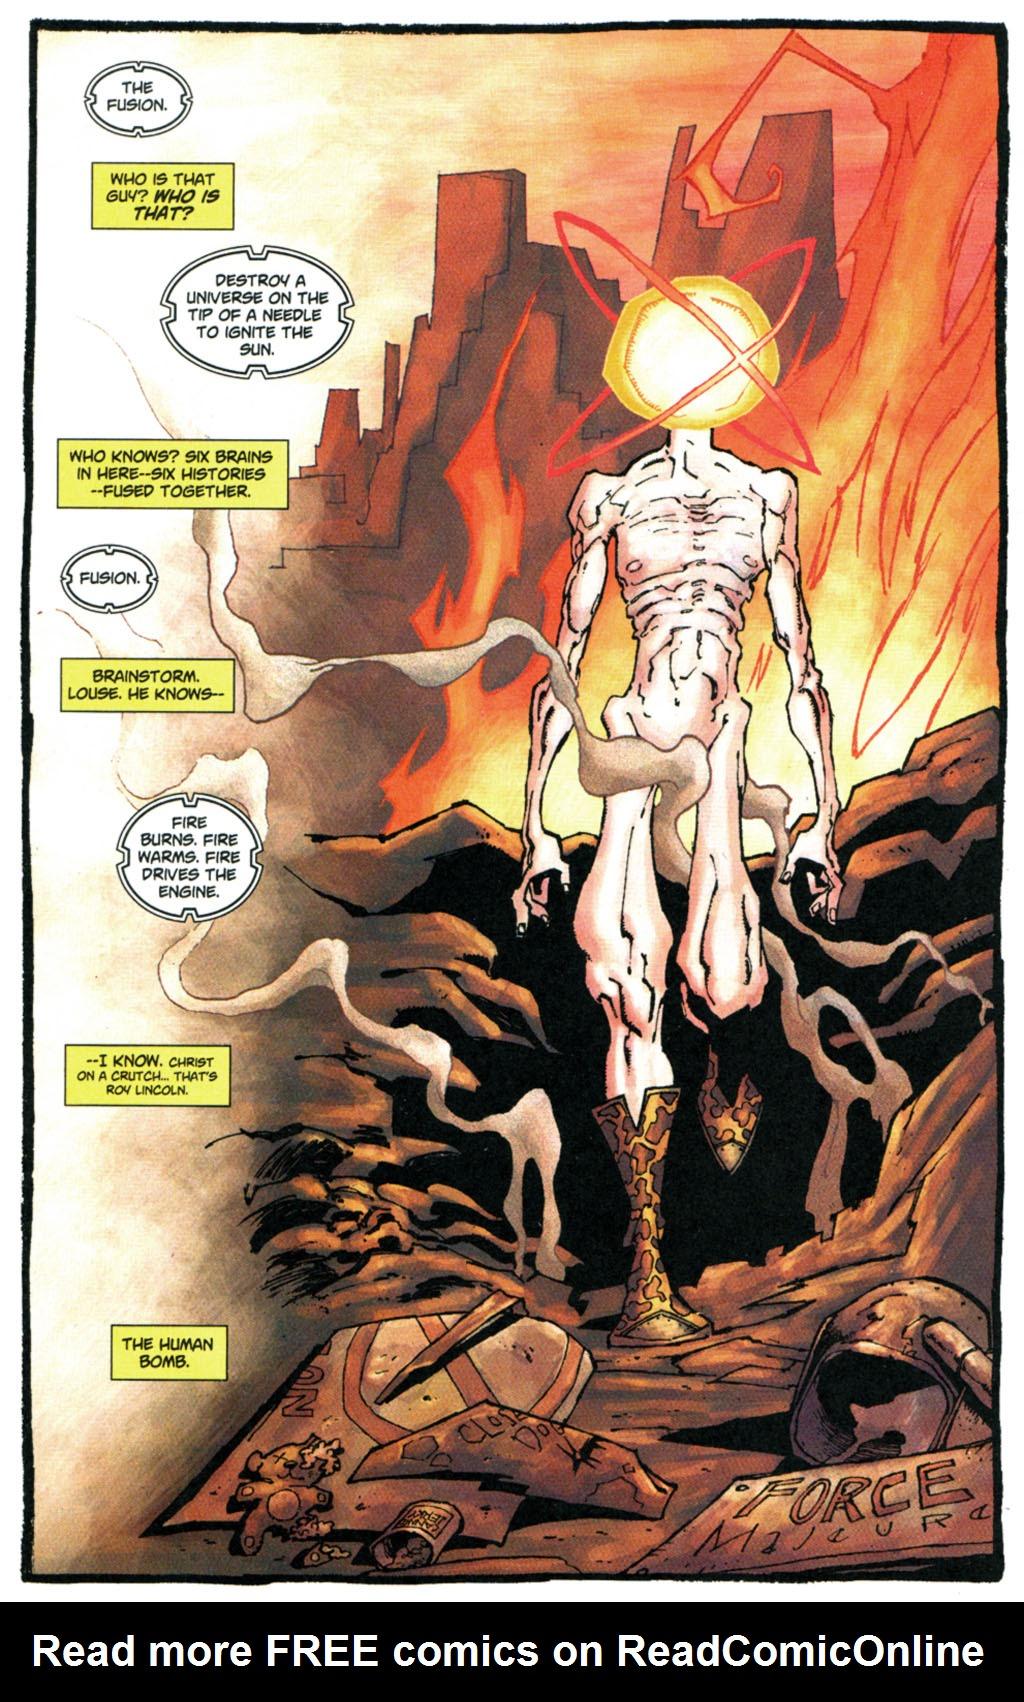 Read online Enginehead comic -  Issue #5 - 12